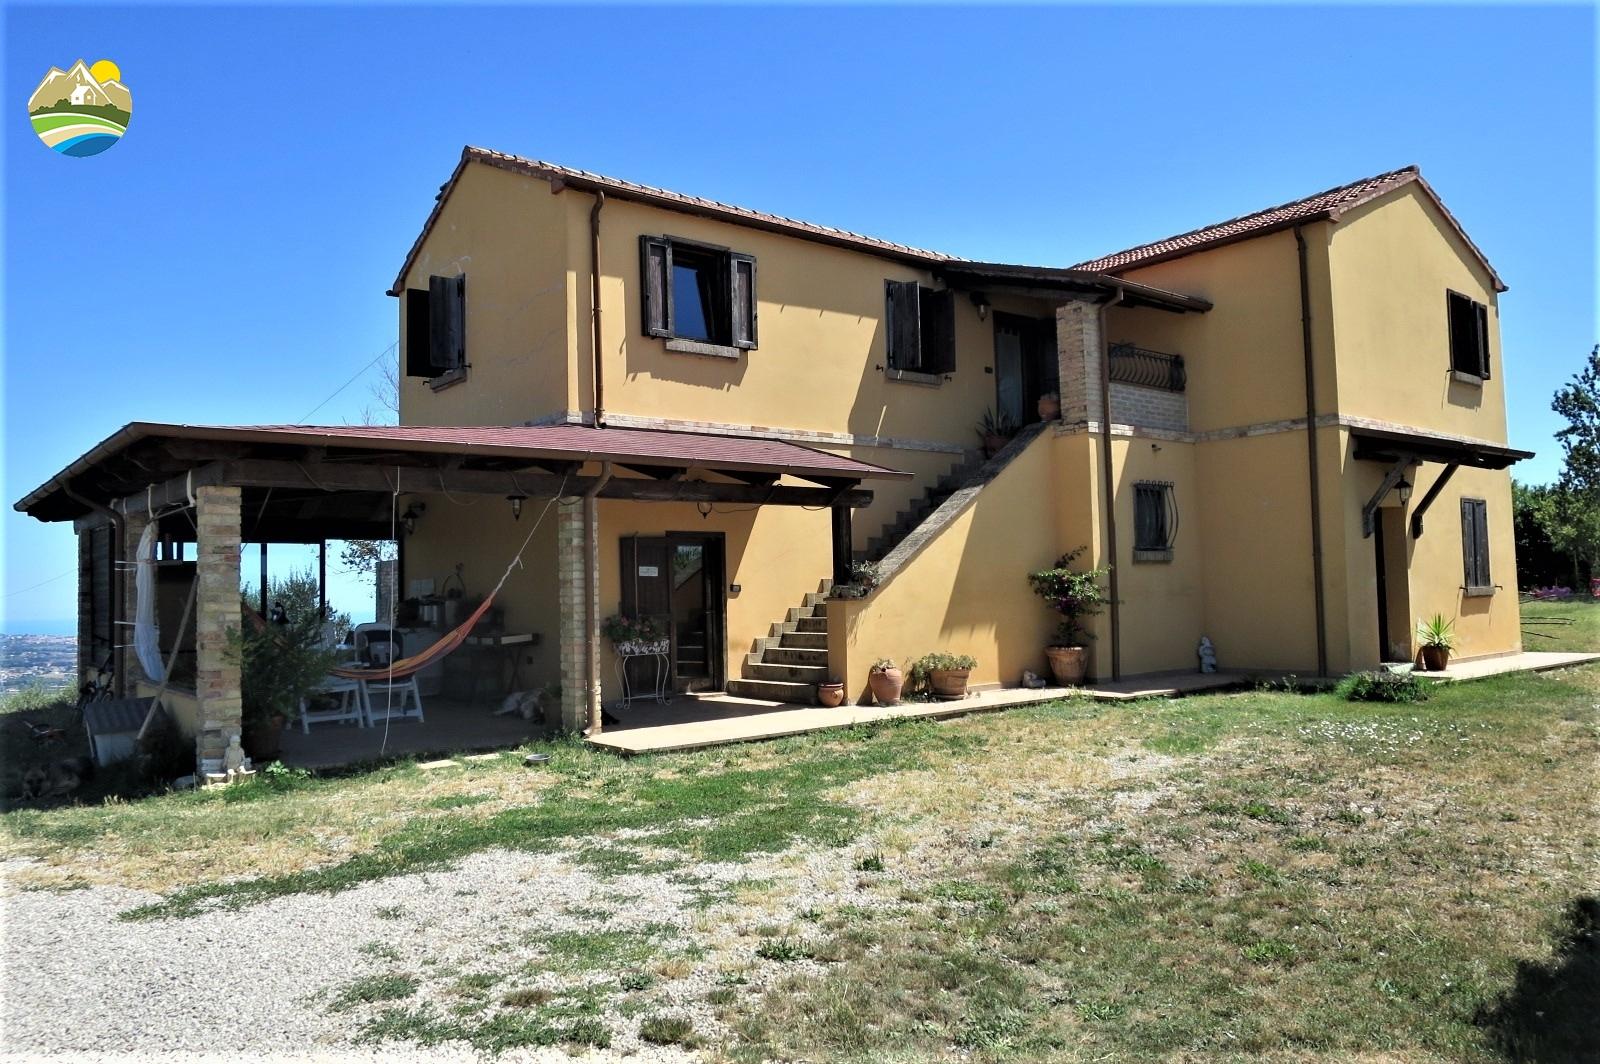 Country Houses Country Houses for sale Morro D'Oro (TE), Casa del Moro - Morro D'Oro - EUR 327.141 10